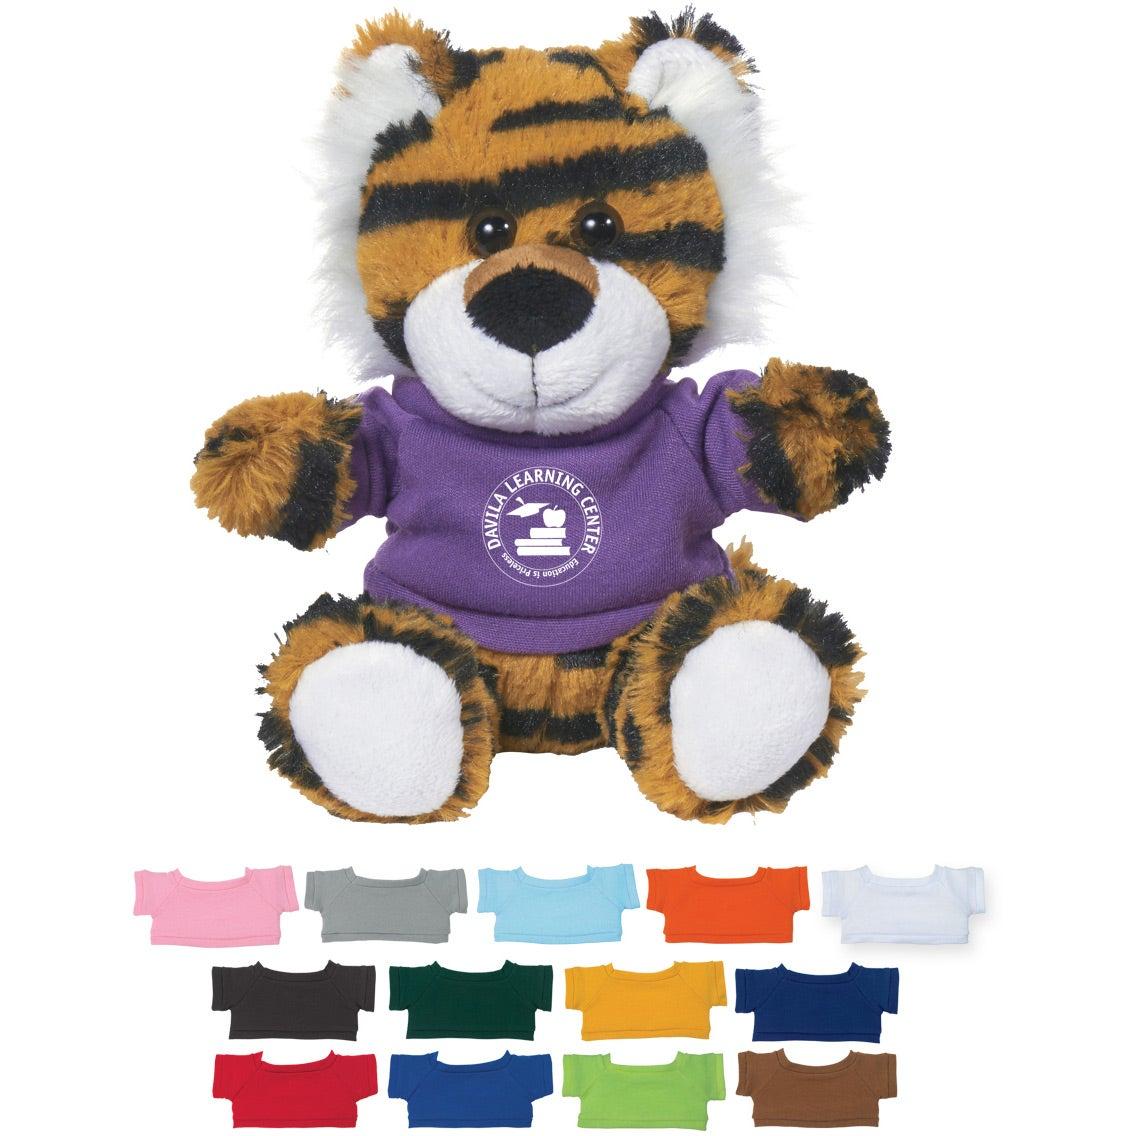 "Terrific Tiger Plush with Shirt (6"")"